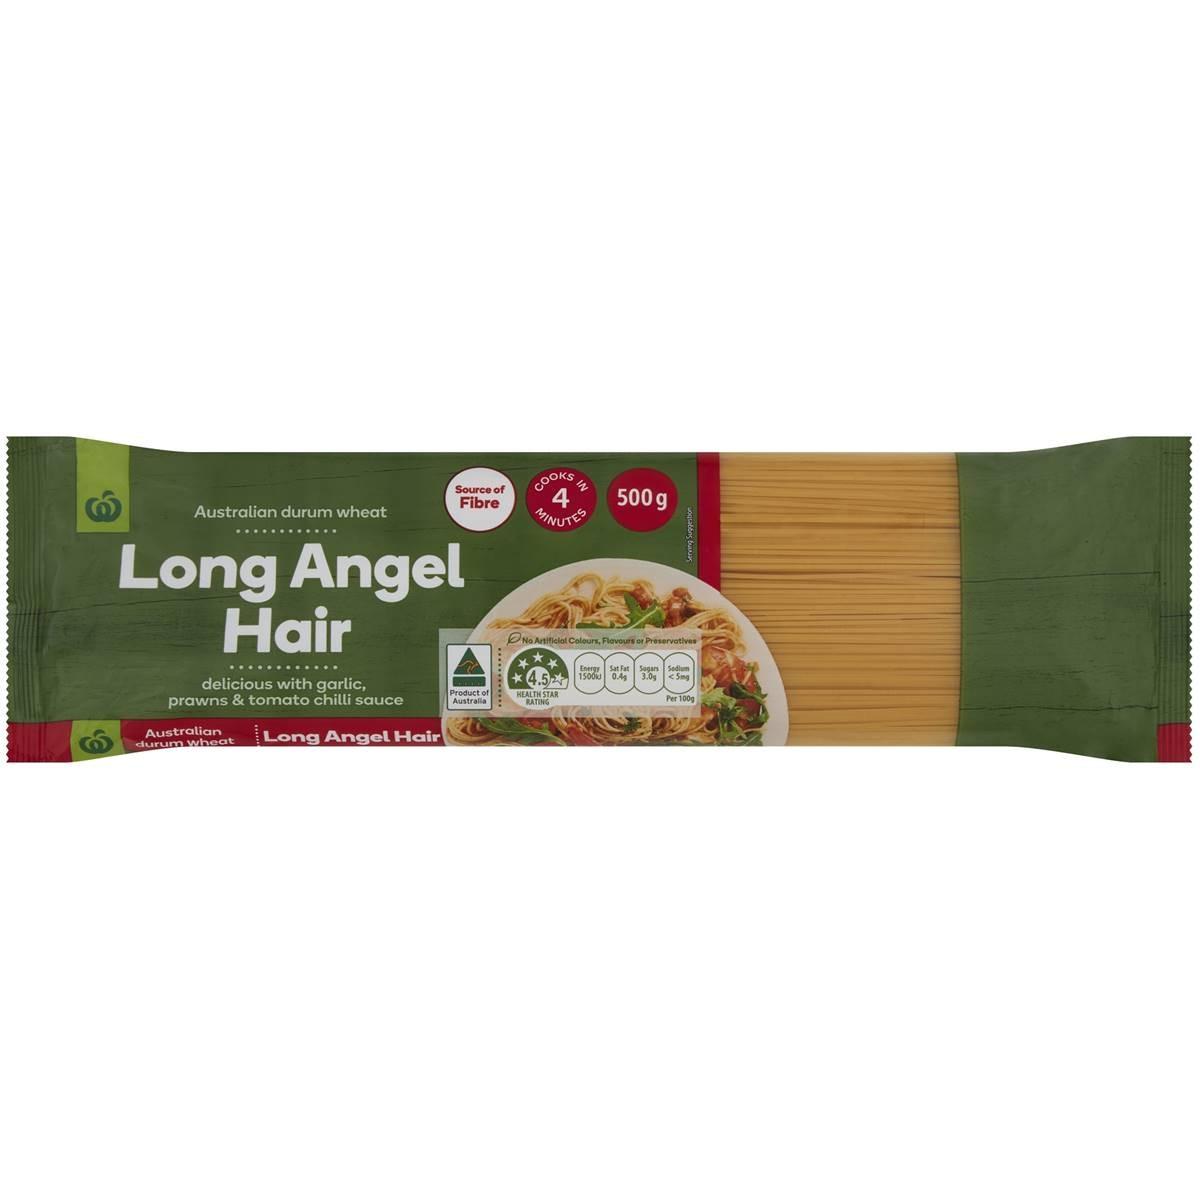 Woolworths Long Angel Hair Pasta